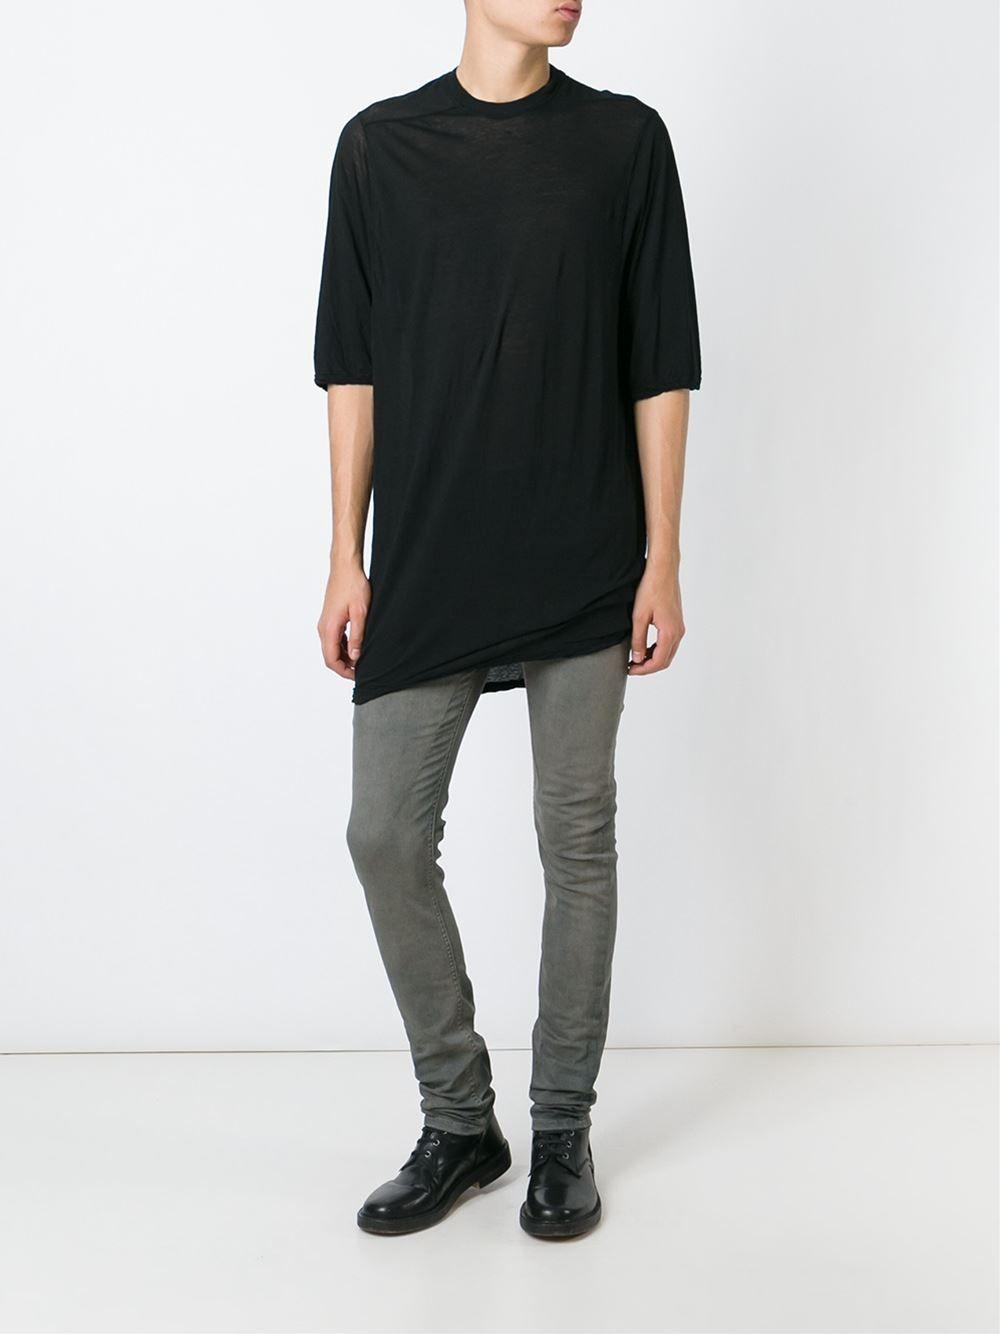 RICK OWENS DRKSHDW  jean skinny classique 305,00 €